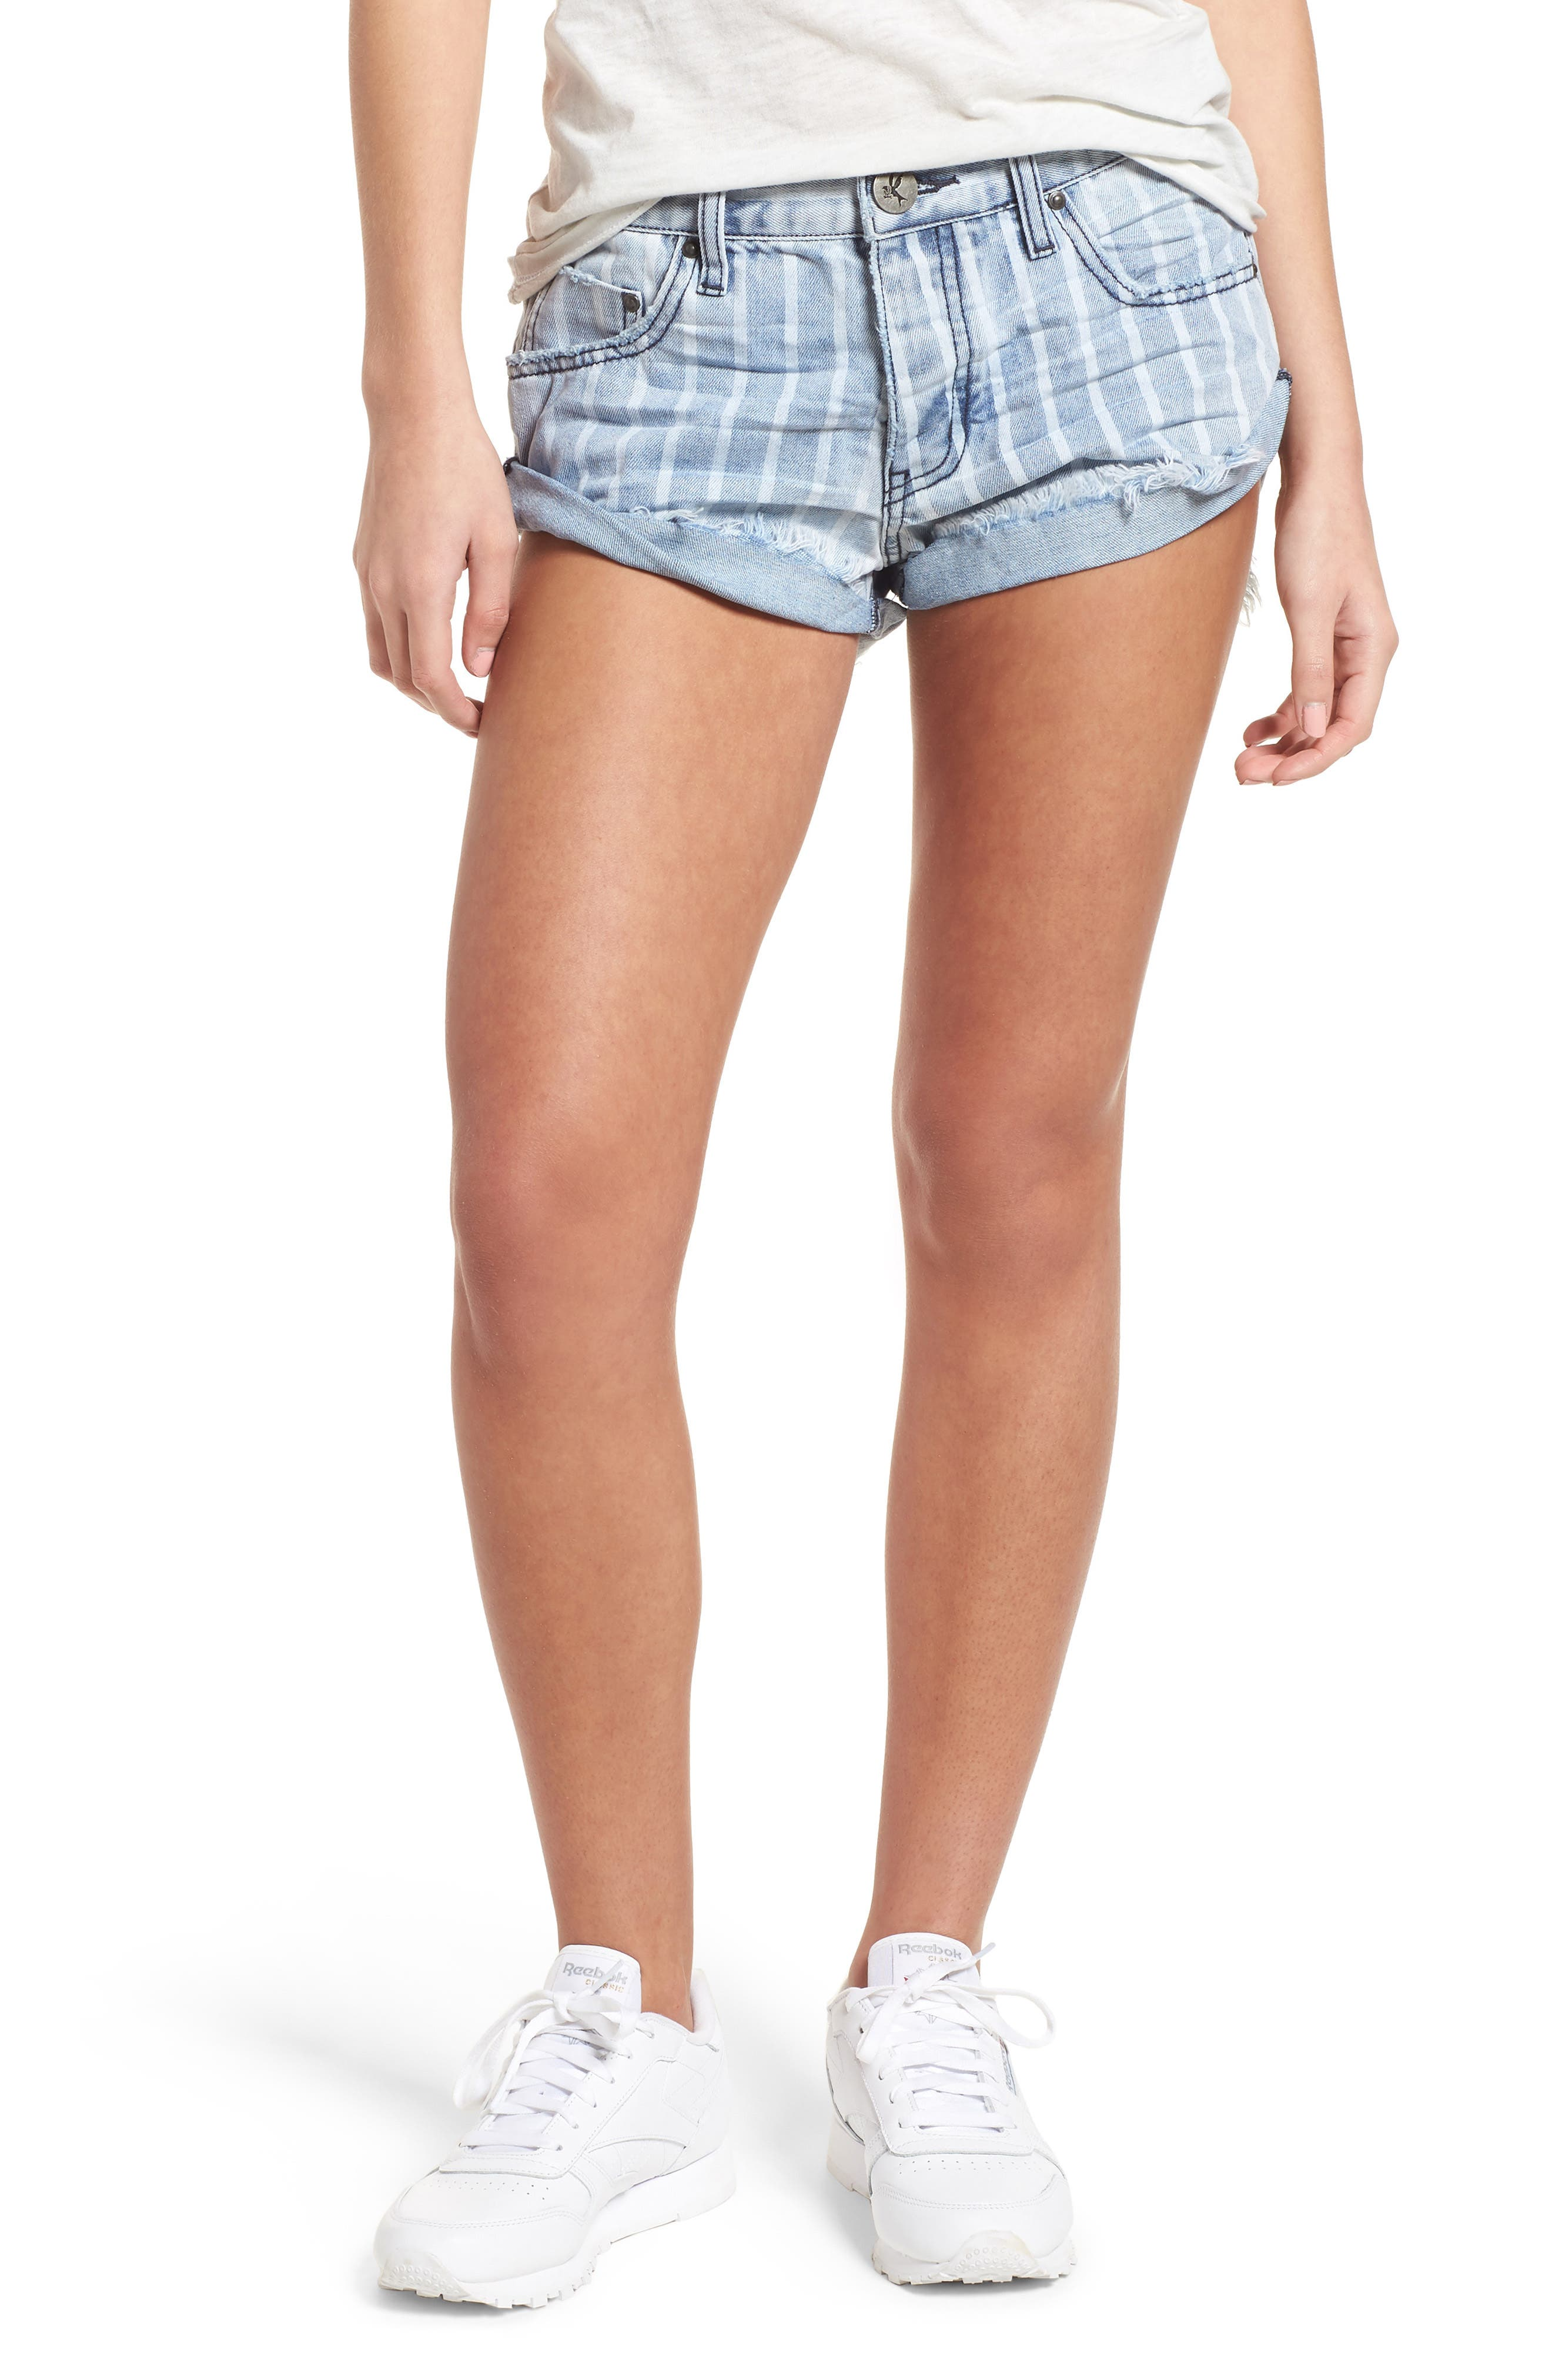 Bandit Stripe Denim Shorts,                             Main thumbnail 1, color,                             400